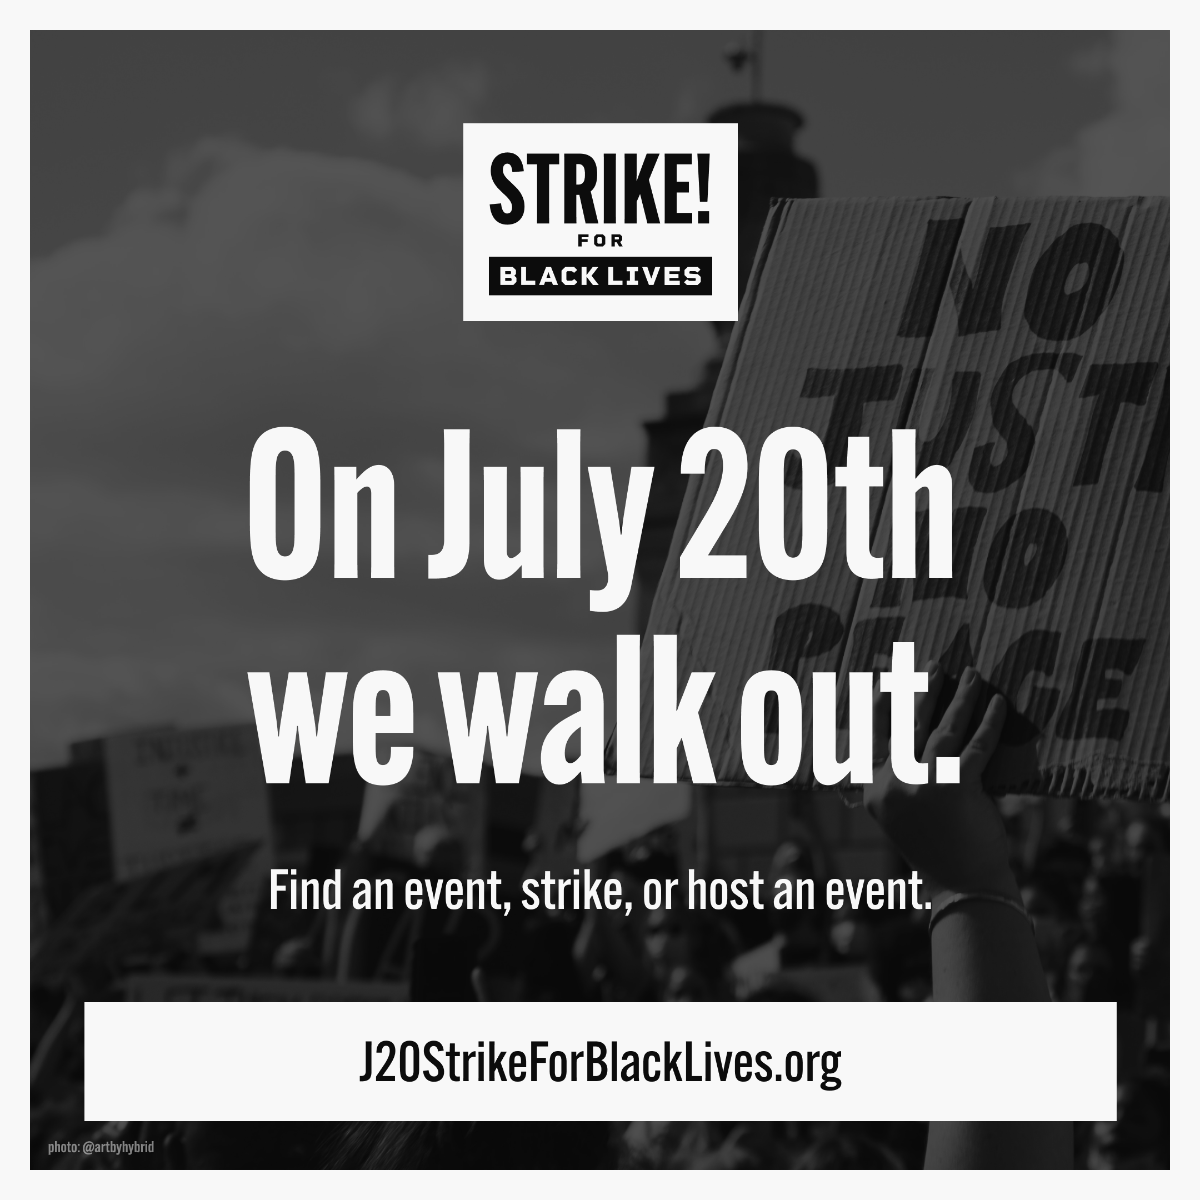 Image card for the strike for black lives